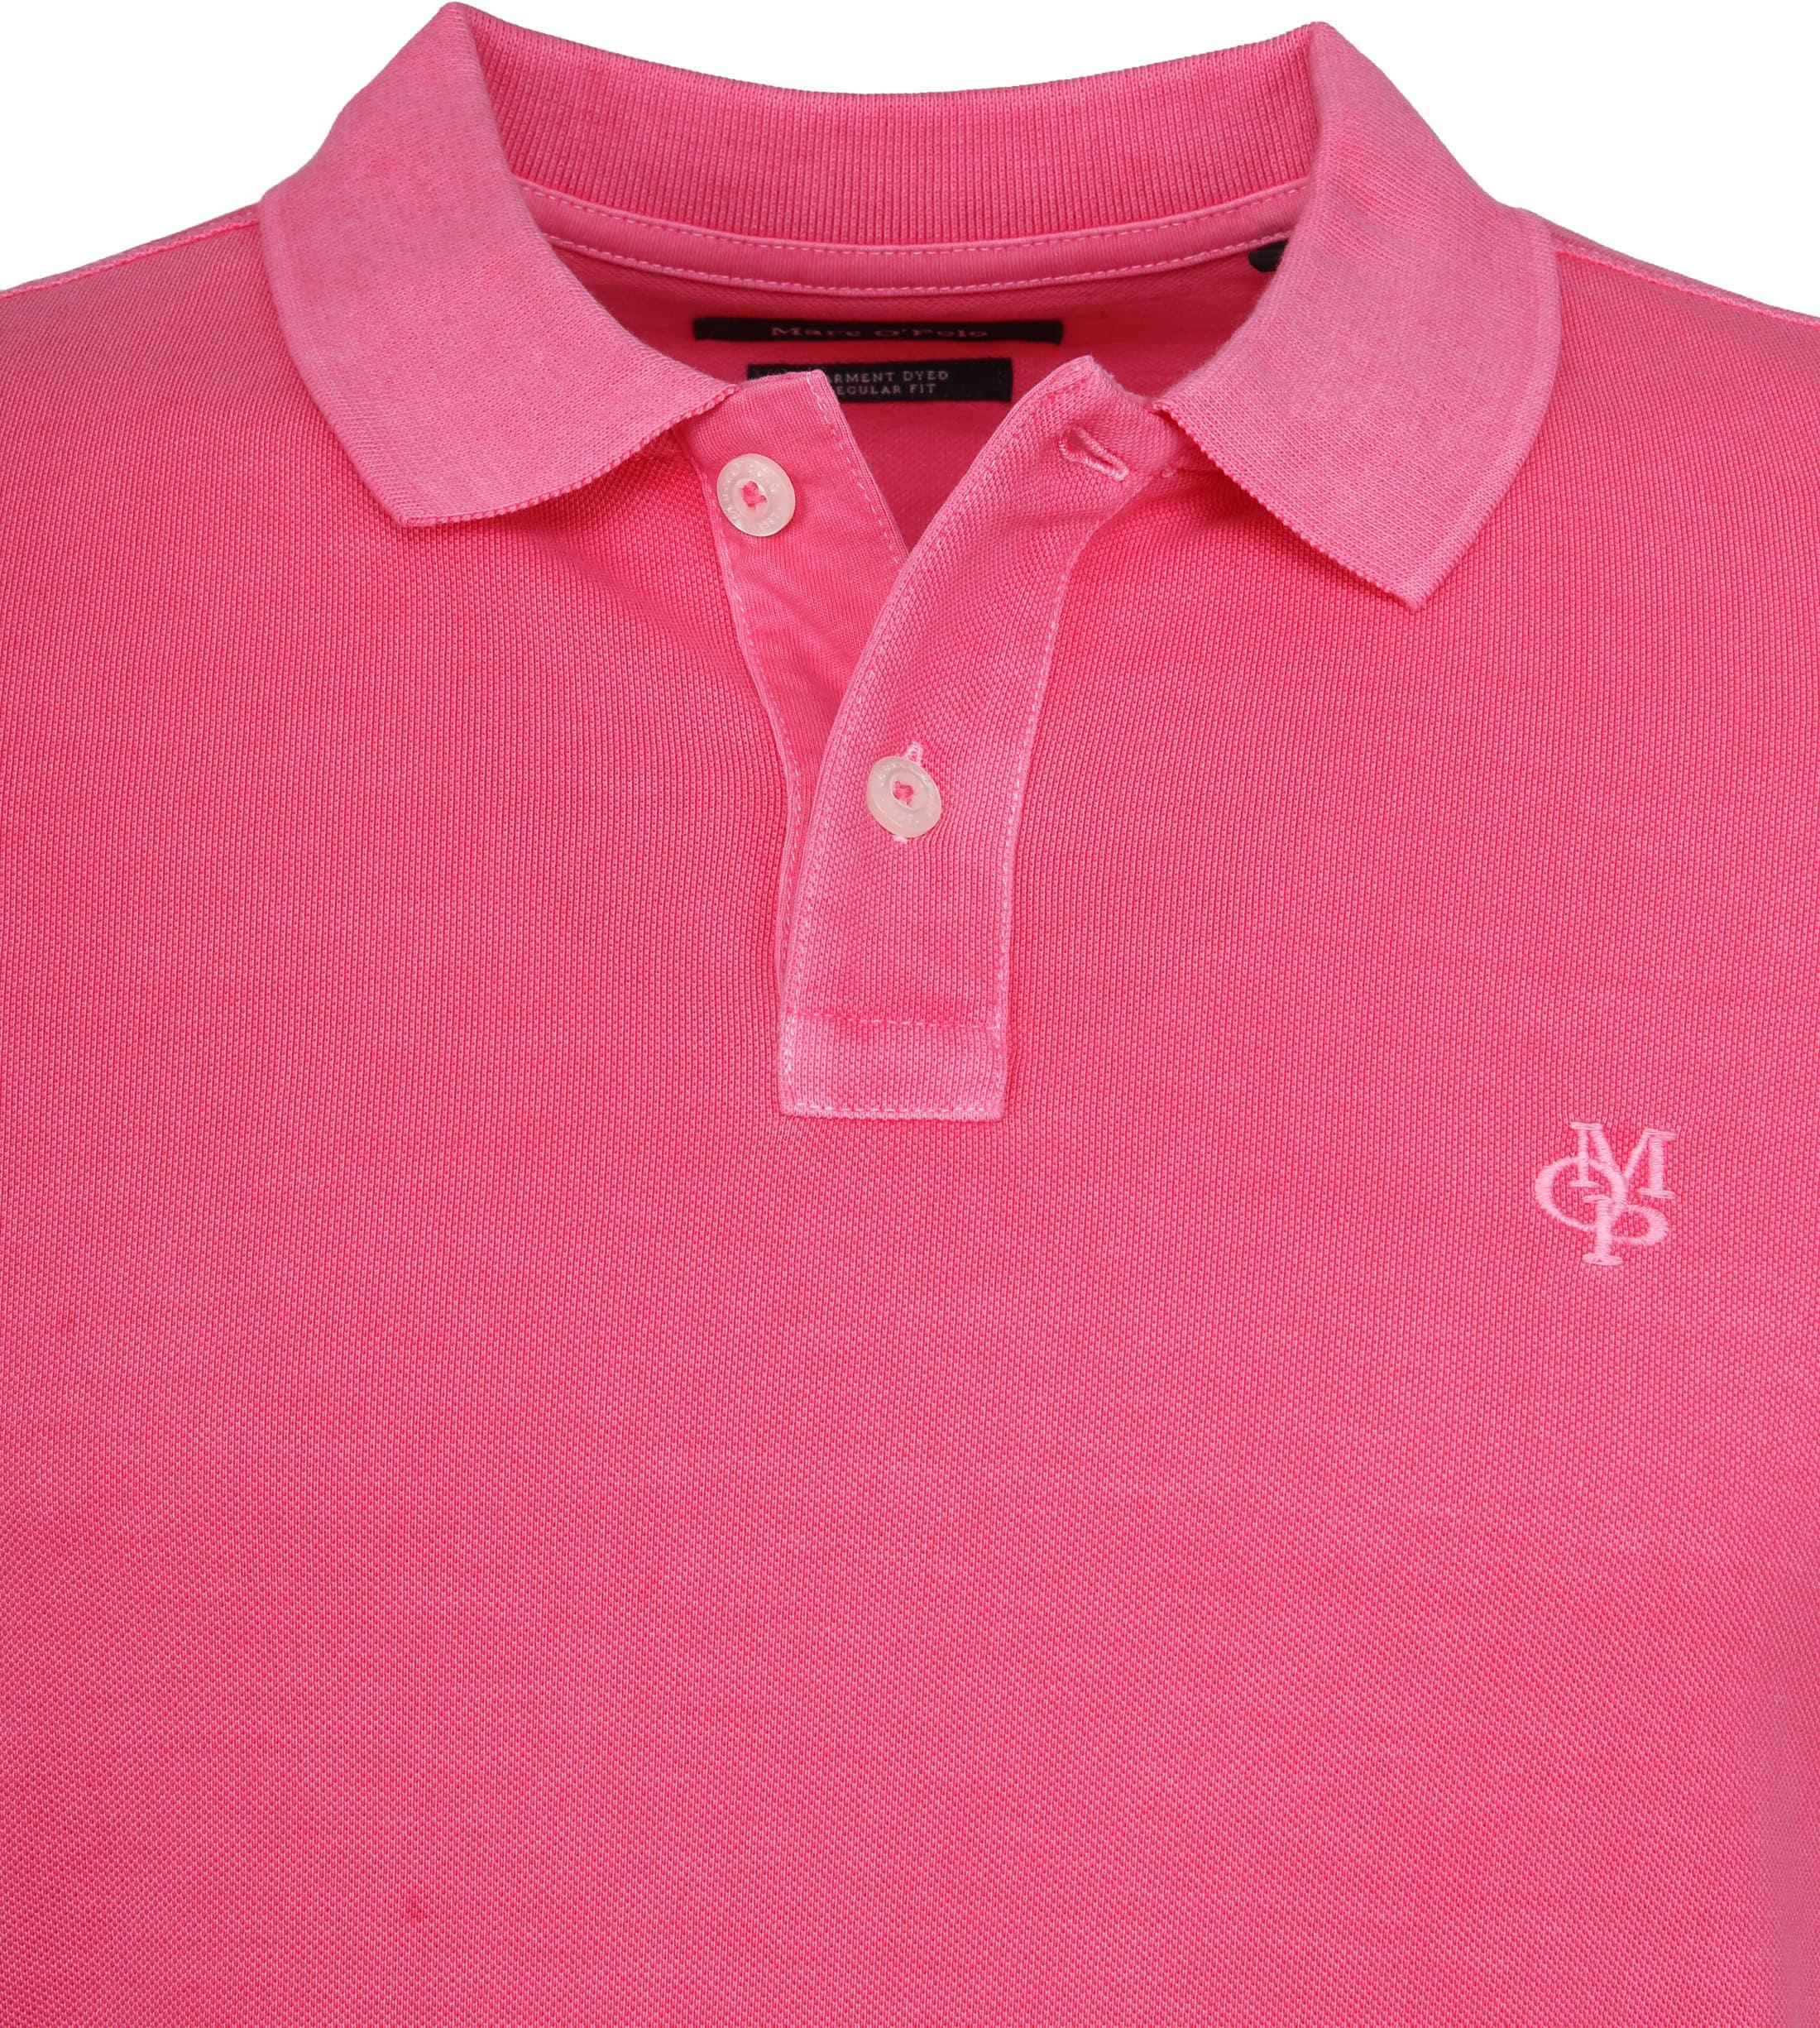 Marc O'Polo Poloshirt Garment Dyed Ibis Pink foto 1